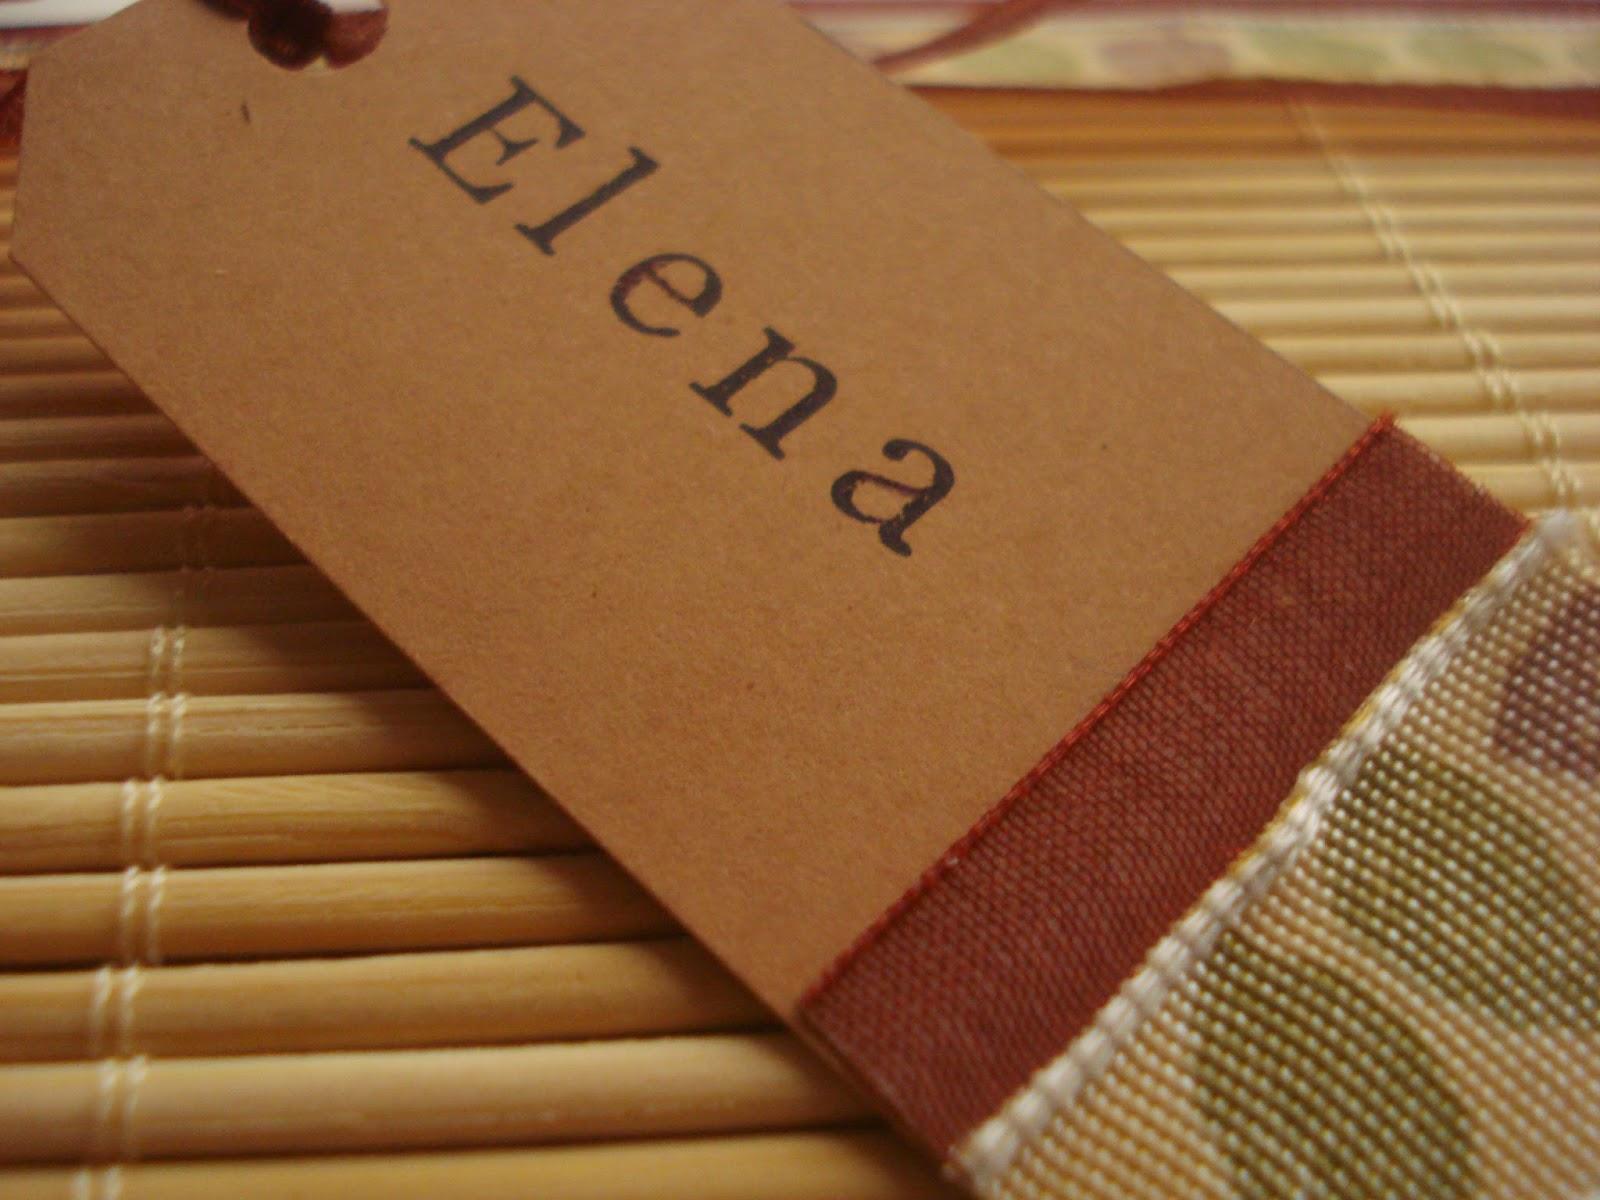 Caja regalo artesanal cosmética ecológica detalle